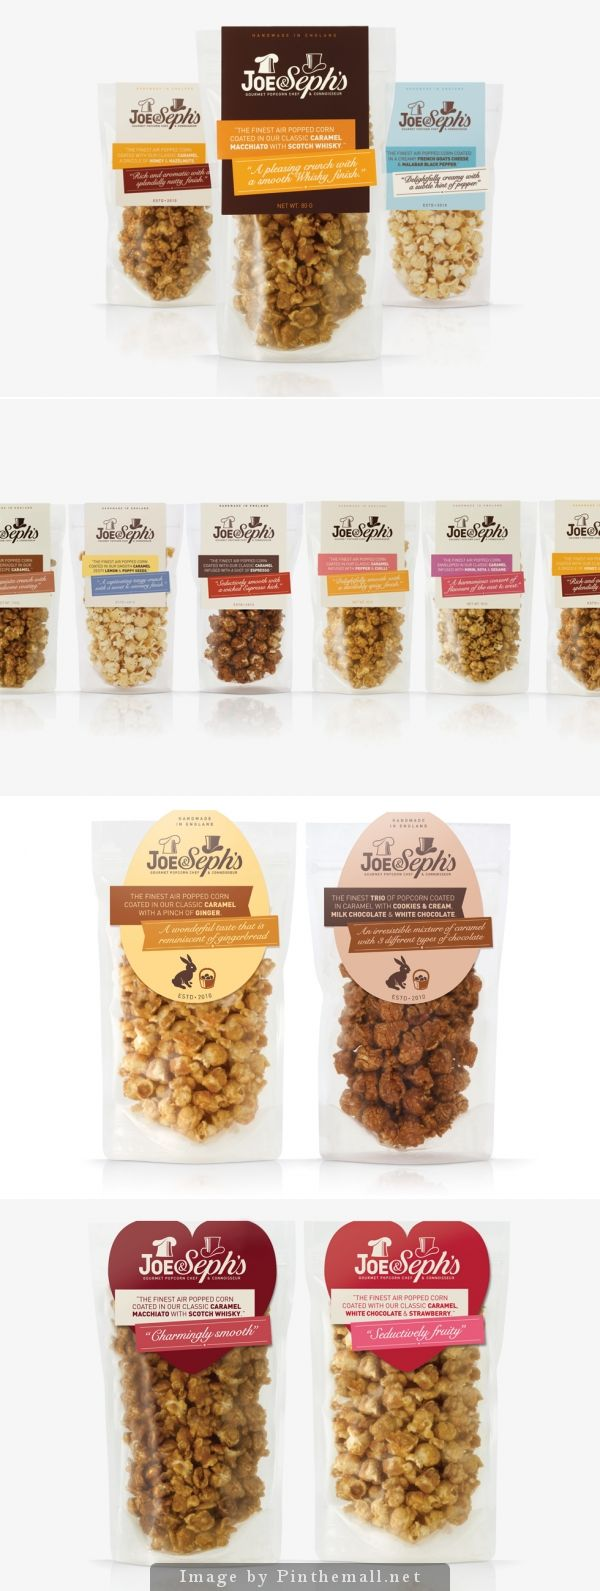 joe sephs-popcorn packaging